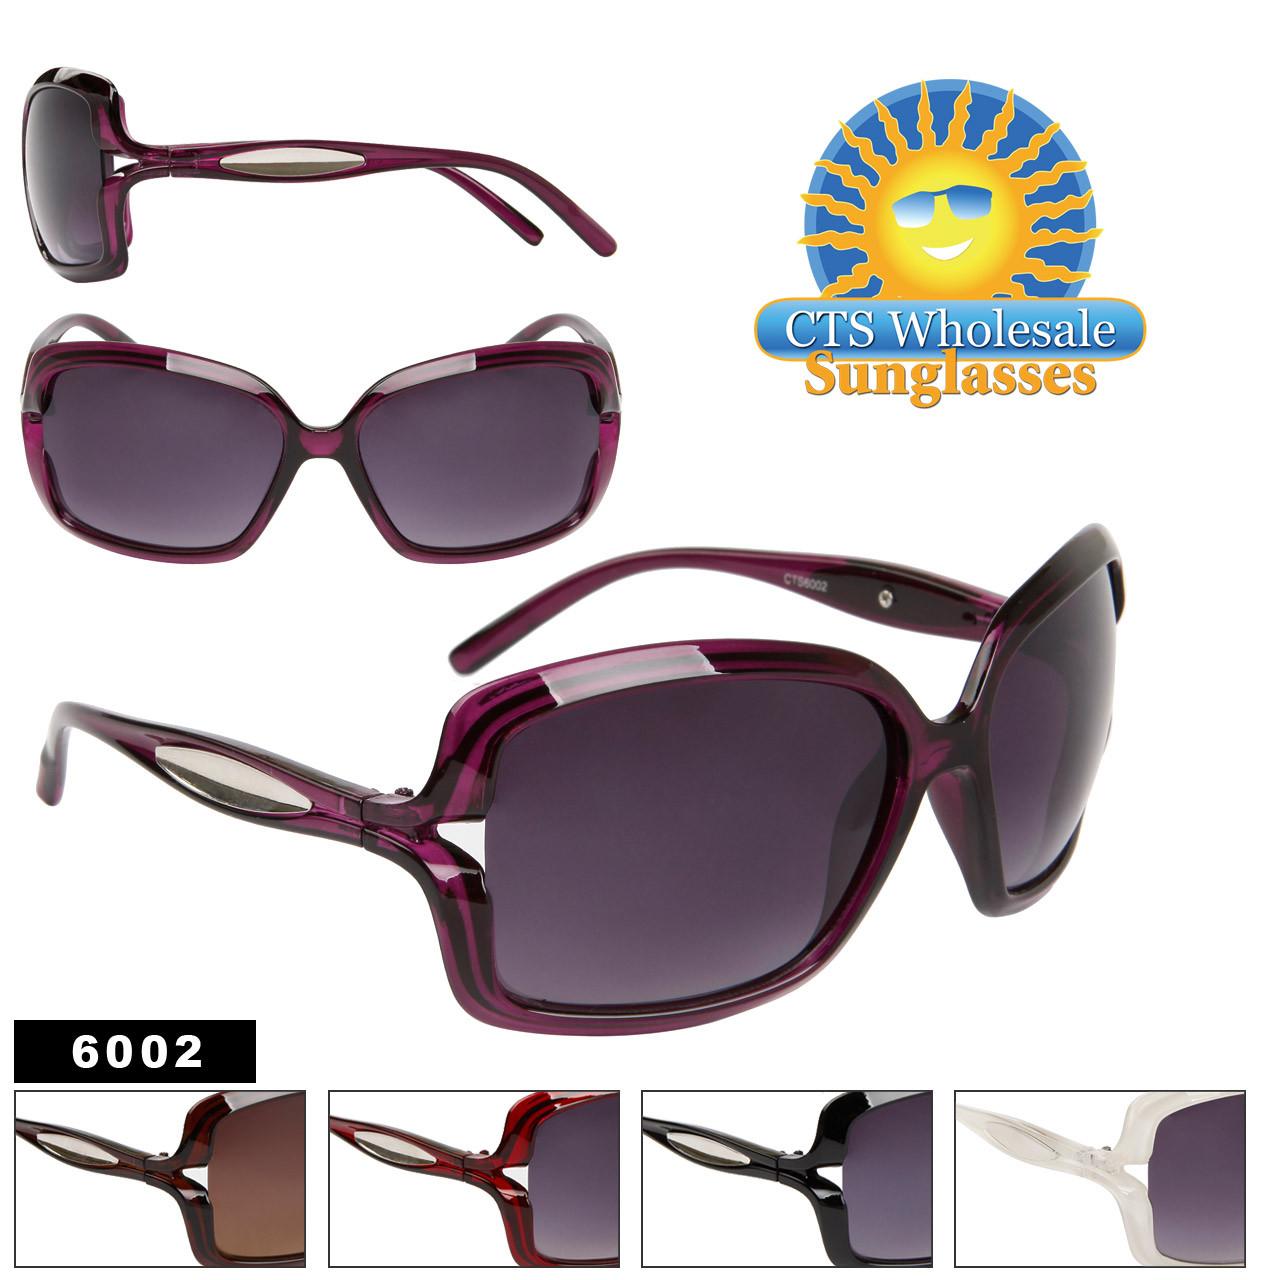 Wholesale Sunglasses 6002